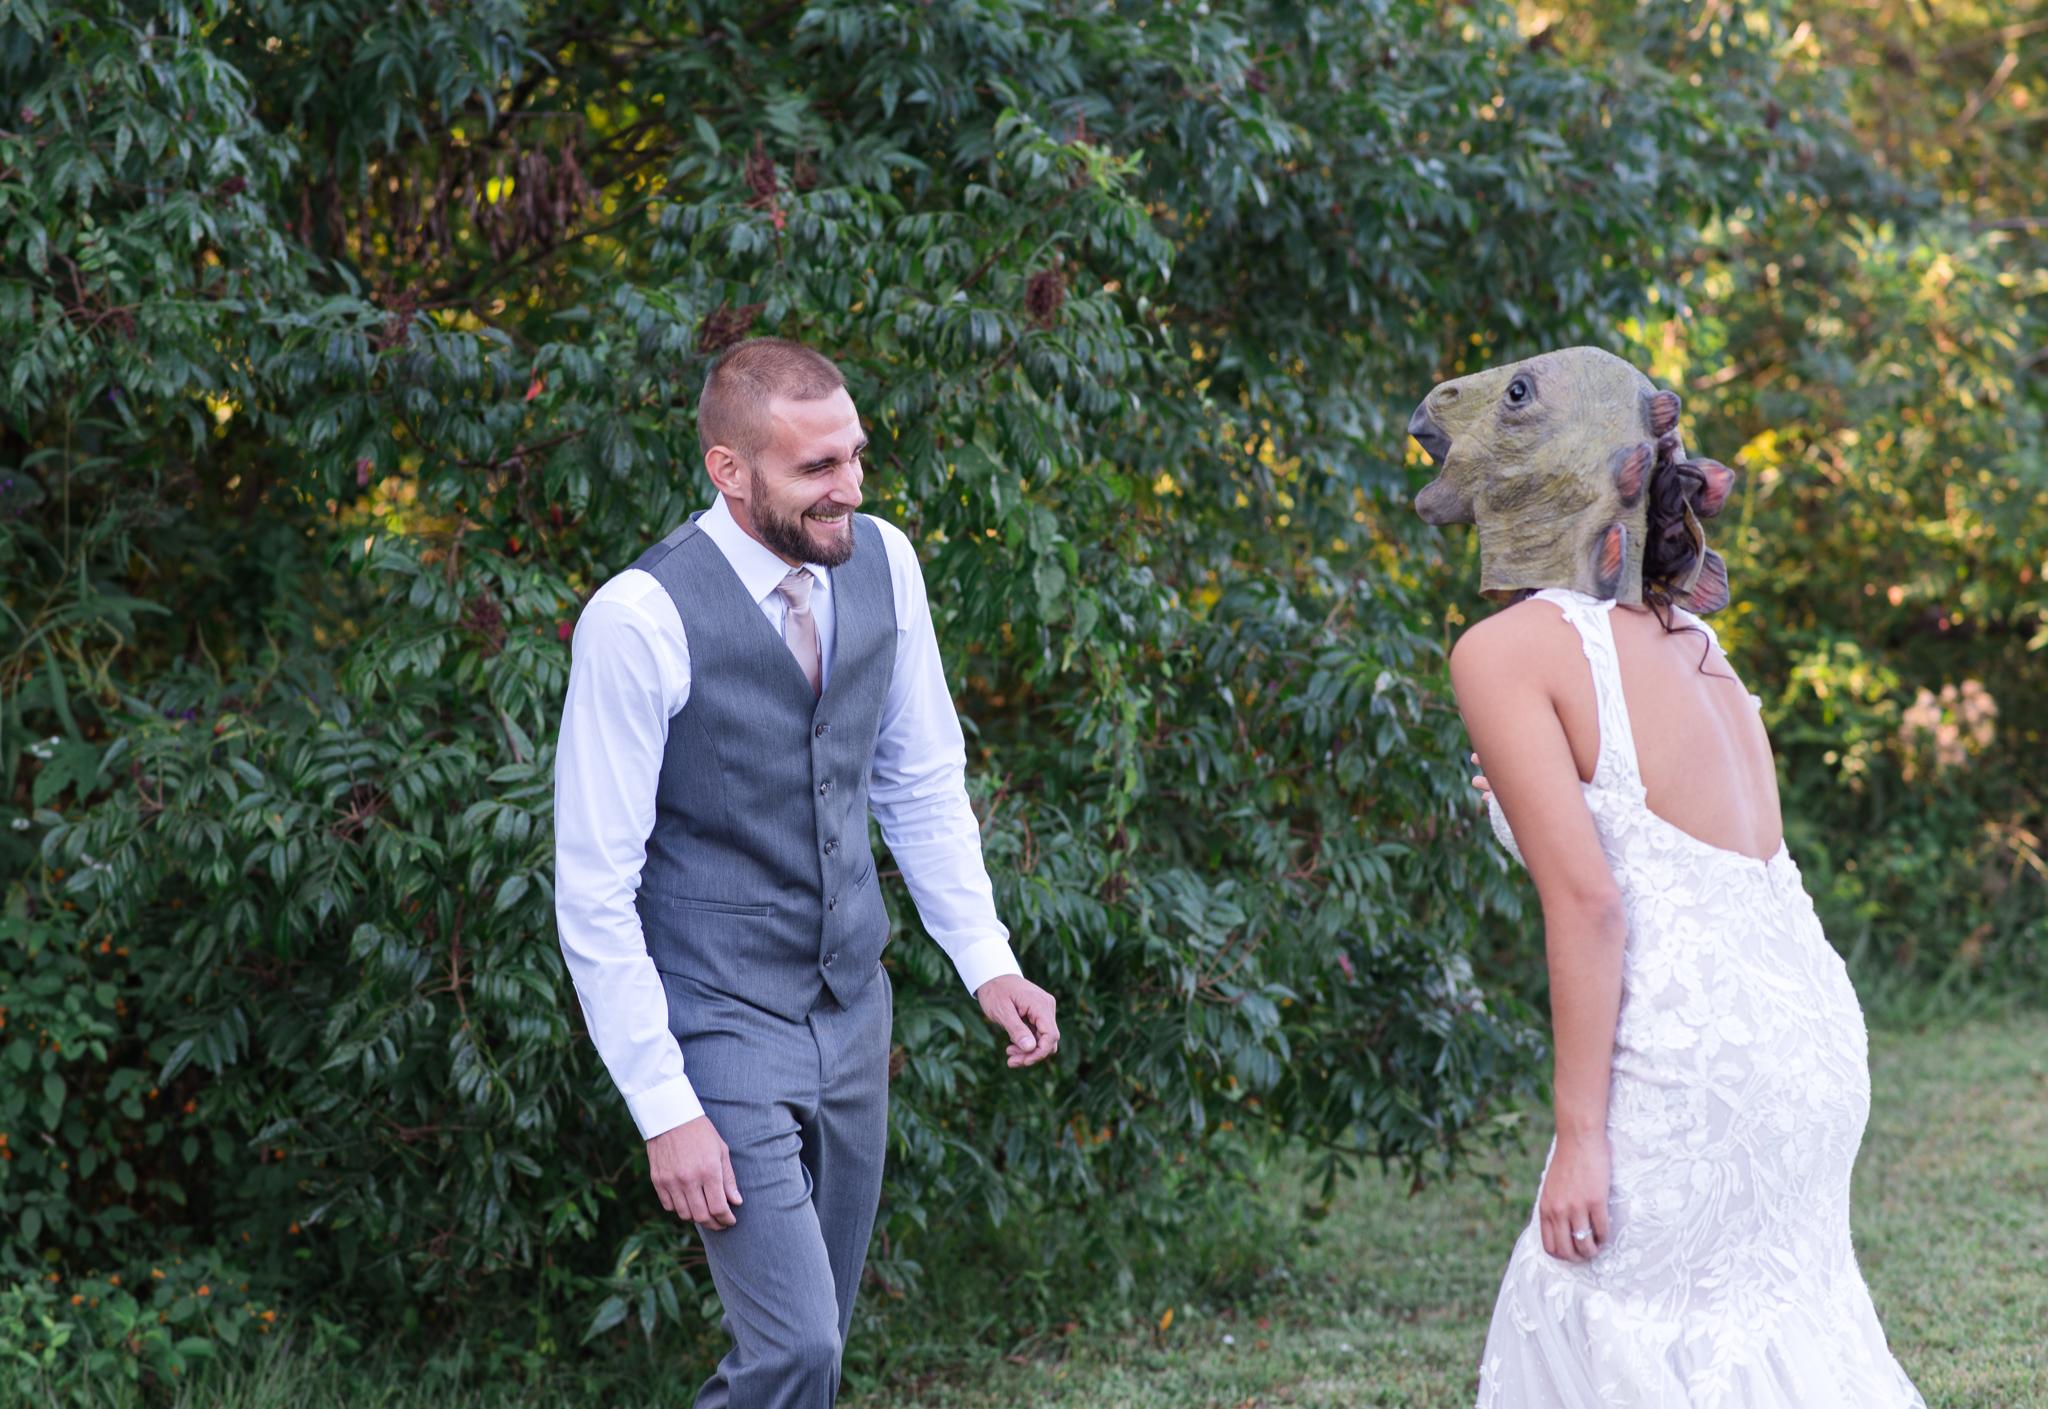 t rex bride, first look, red river gorge, Kentucky wedding photographer